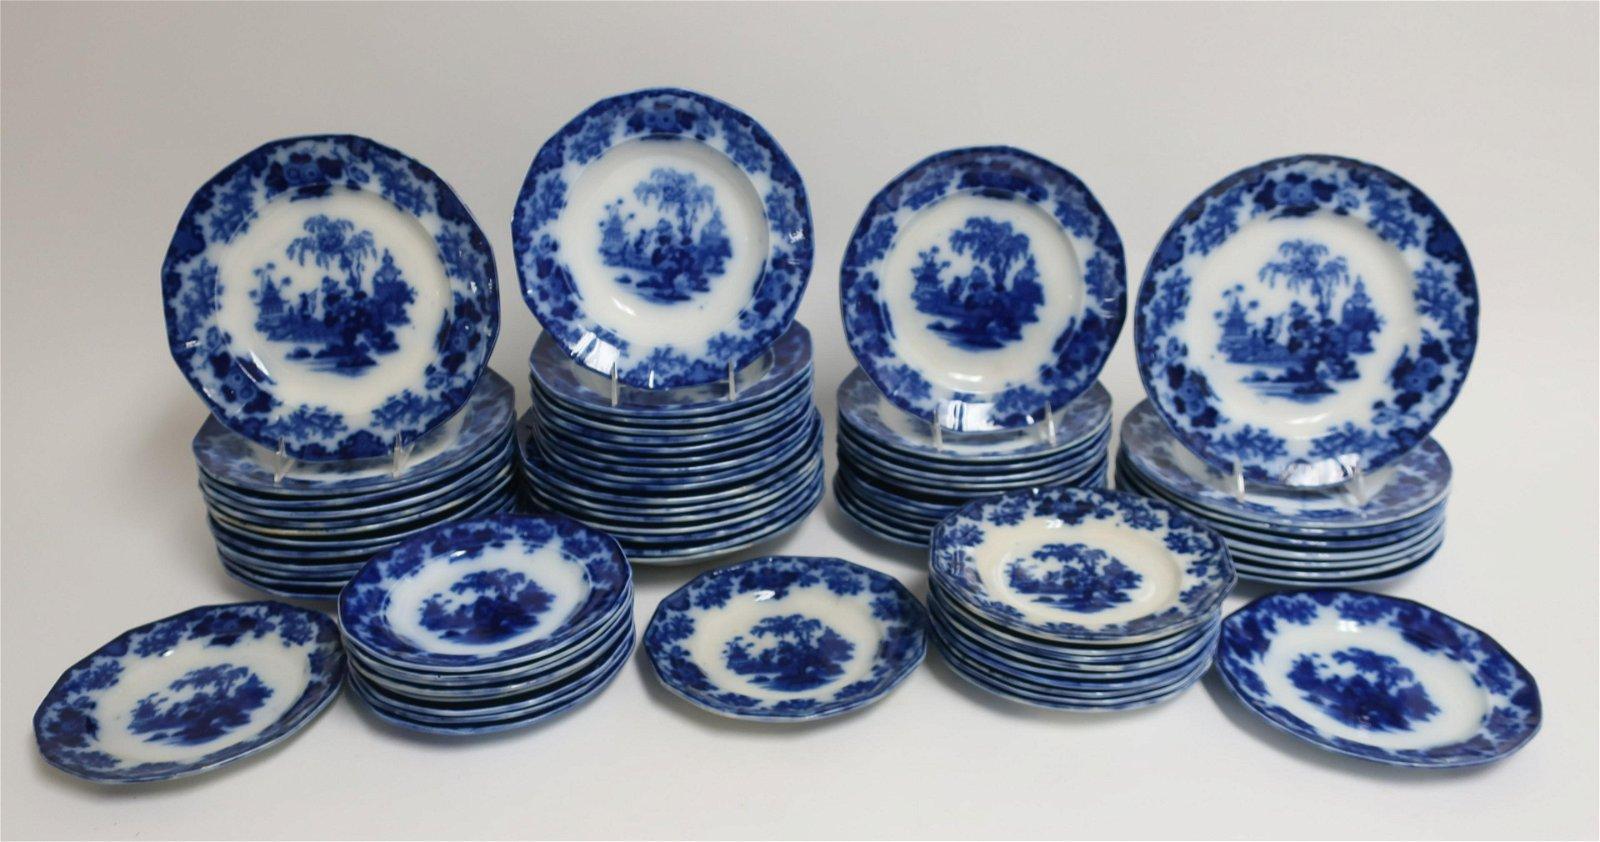 69 Flow Blue 'Scinde' Transferware Plates, 19th C.